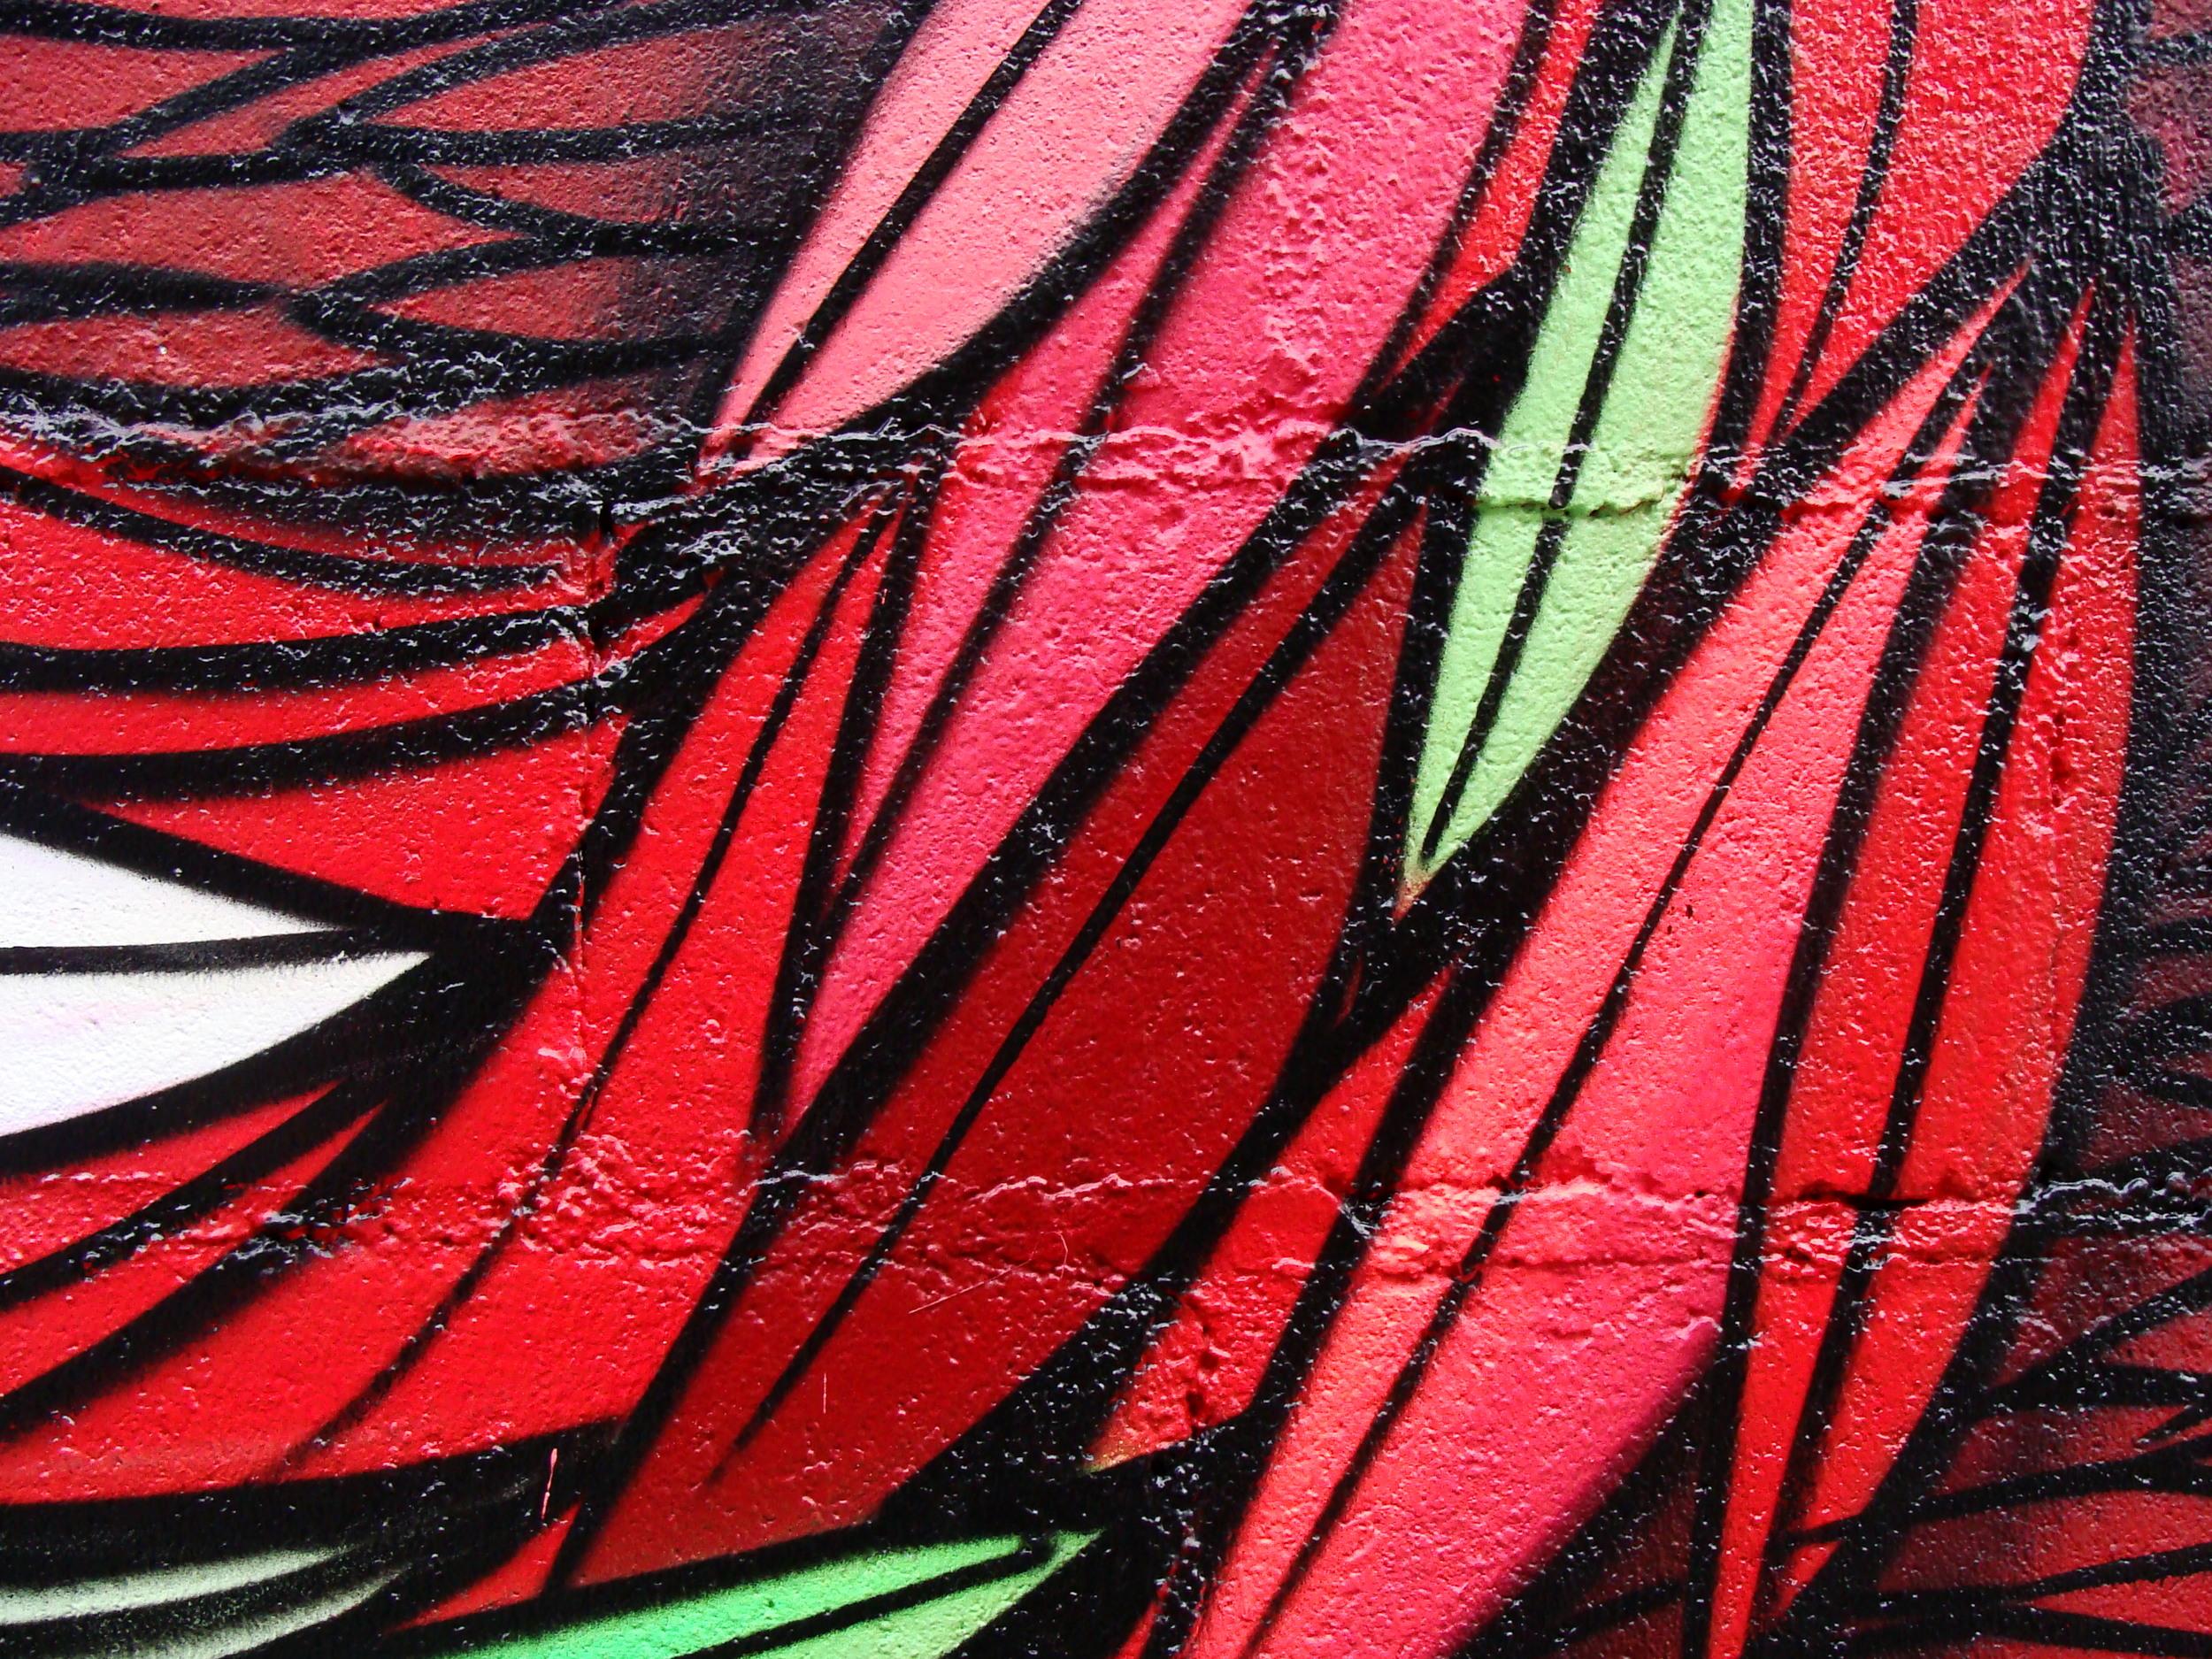 Août 2012 - Canada - Festival des M  usiques Emergentes